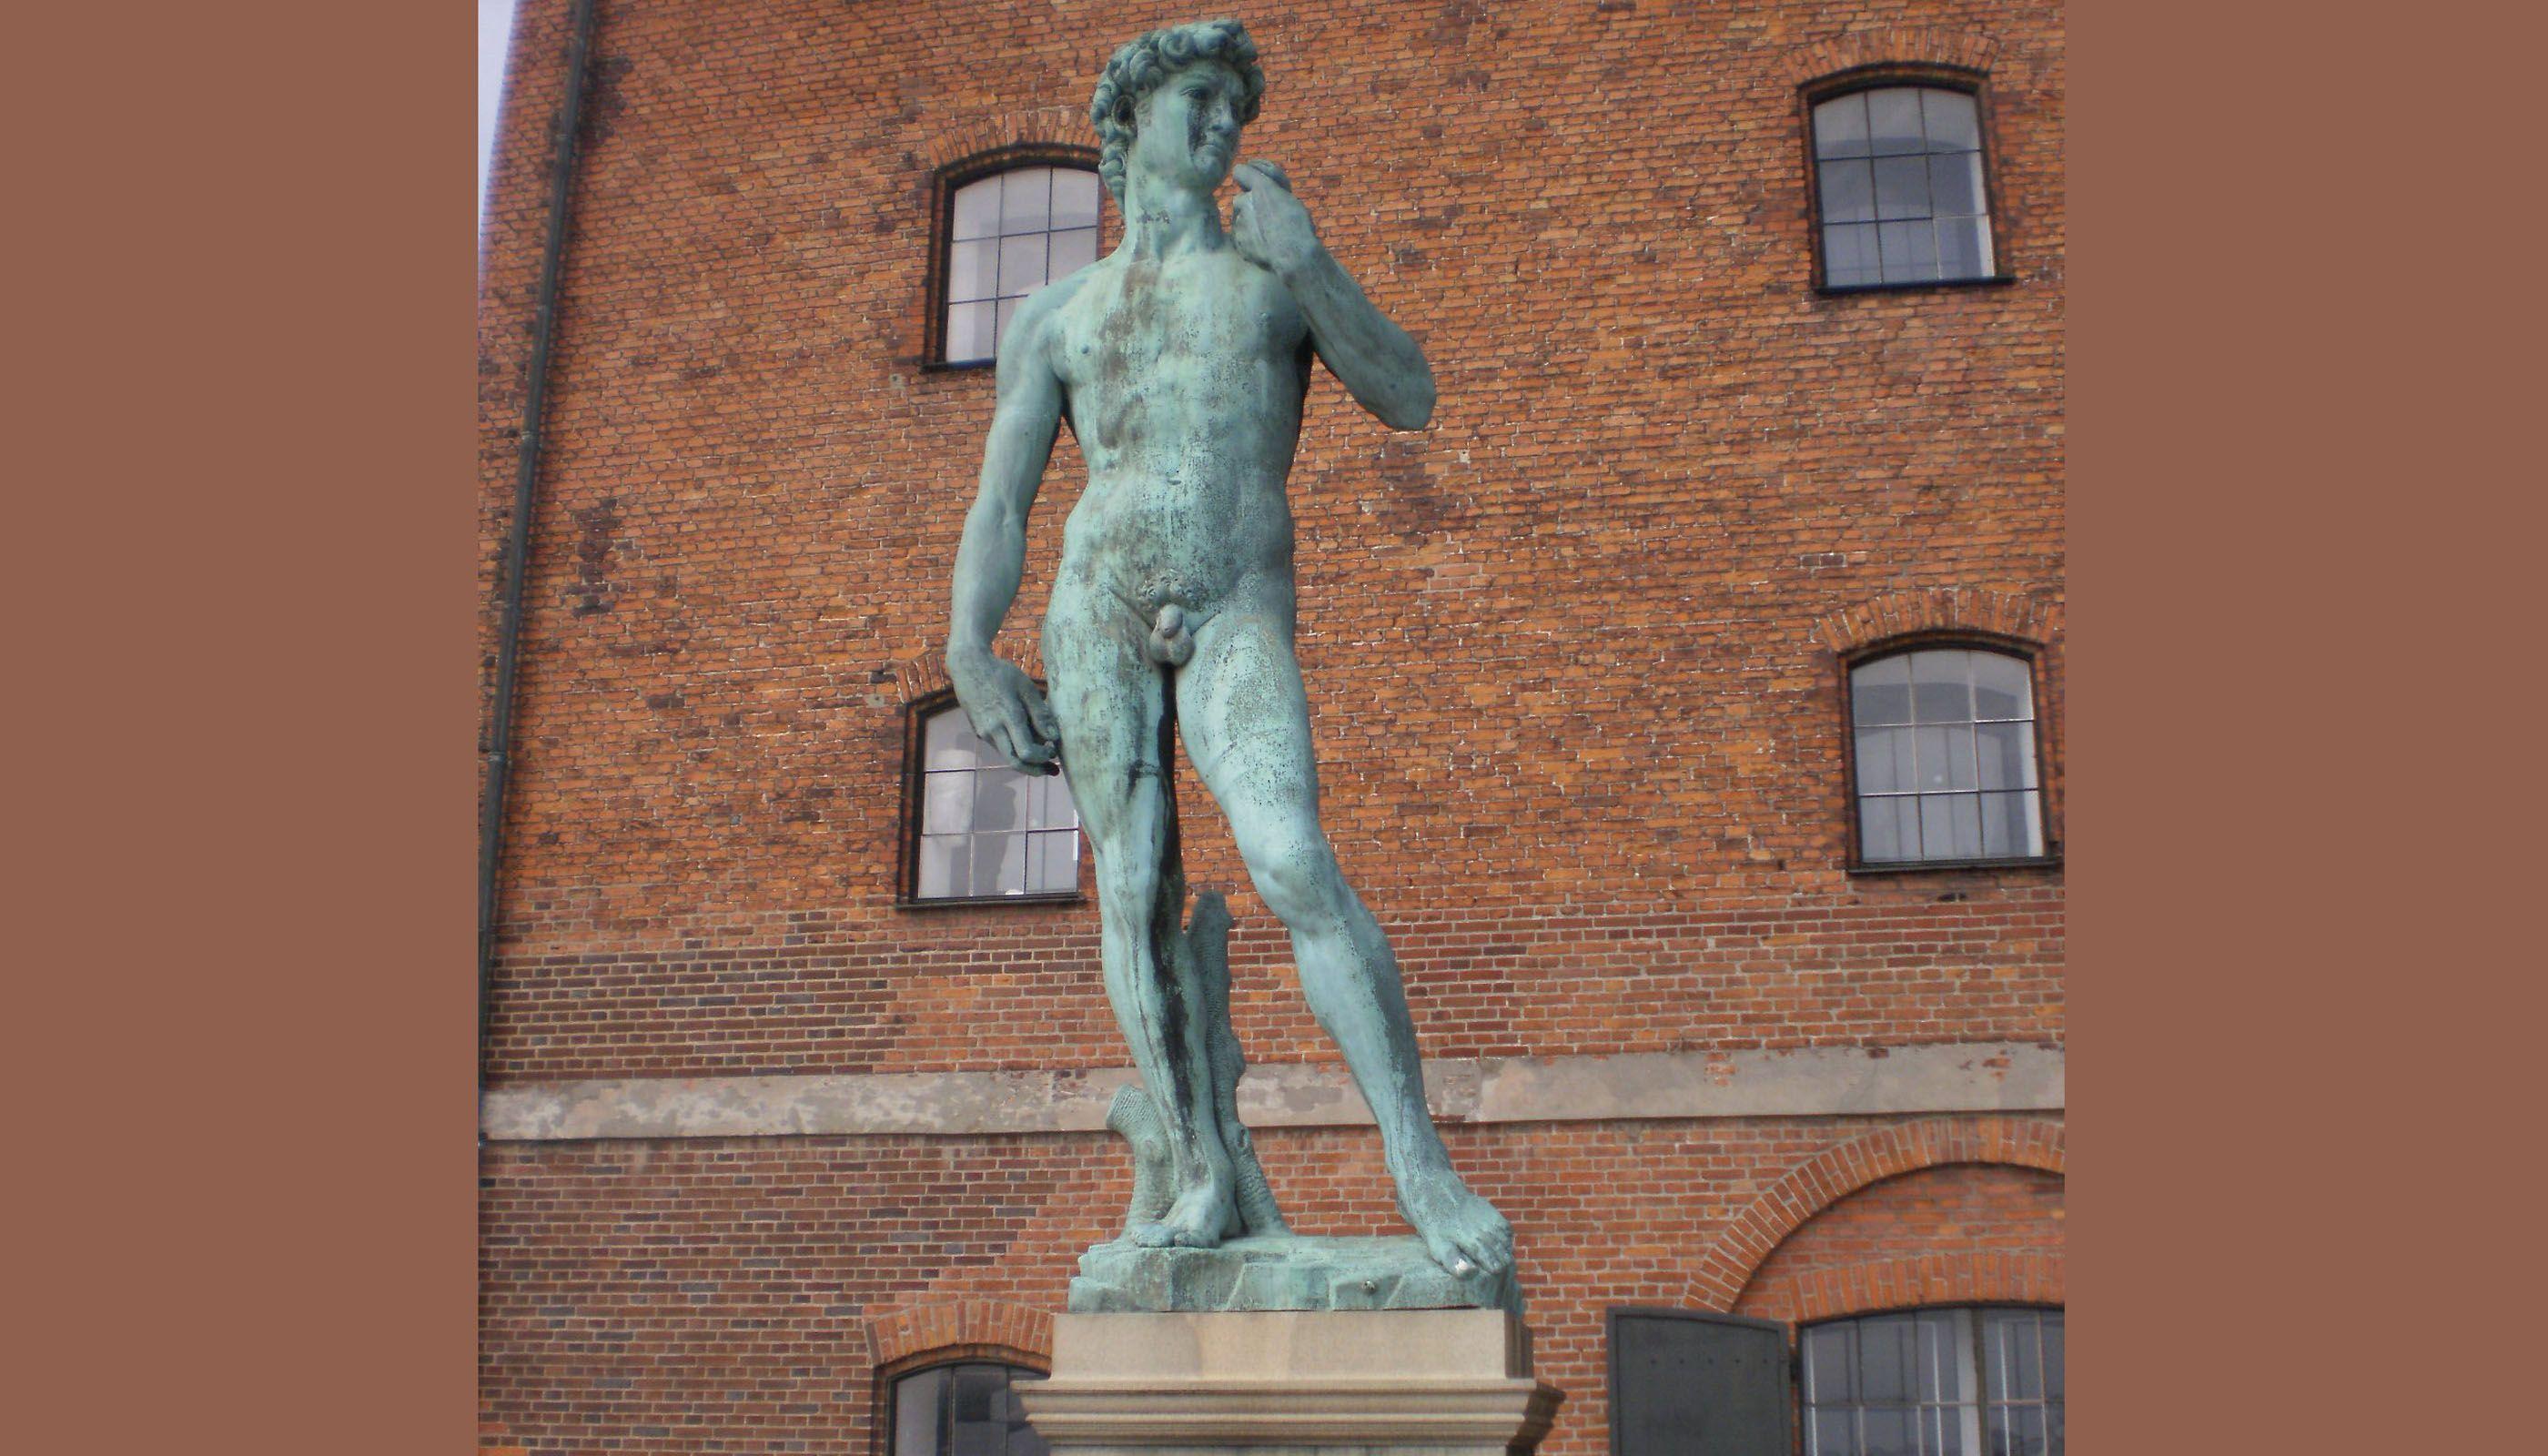 David in Copenhagen (Creative Commons: Shippmeansen)